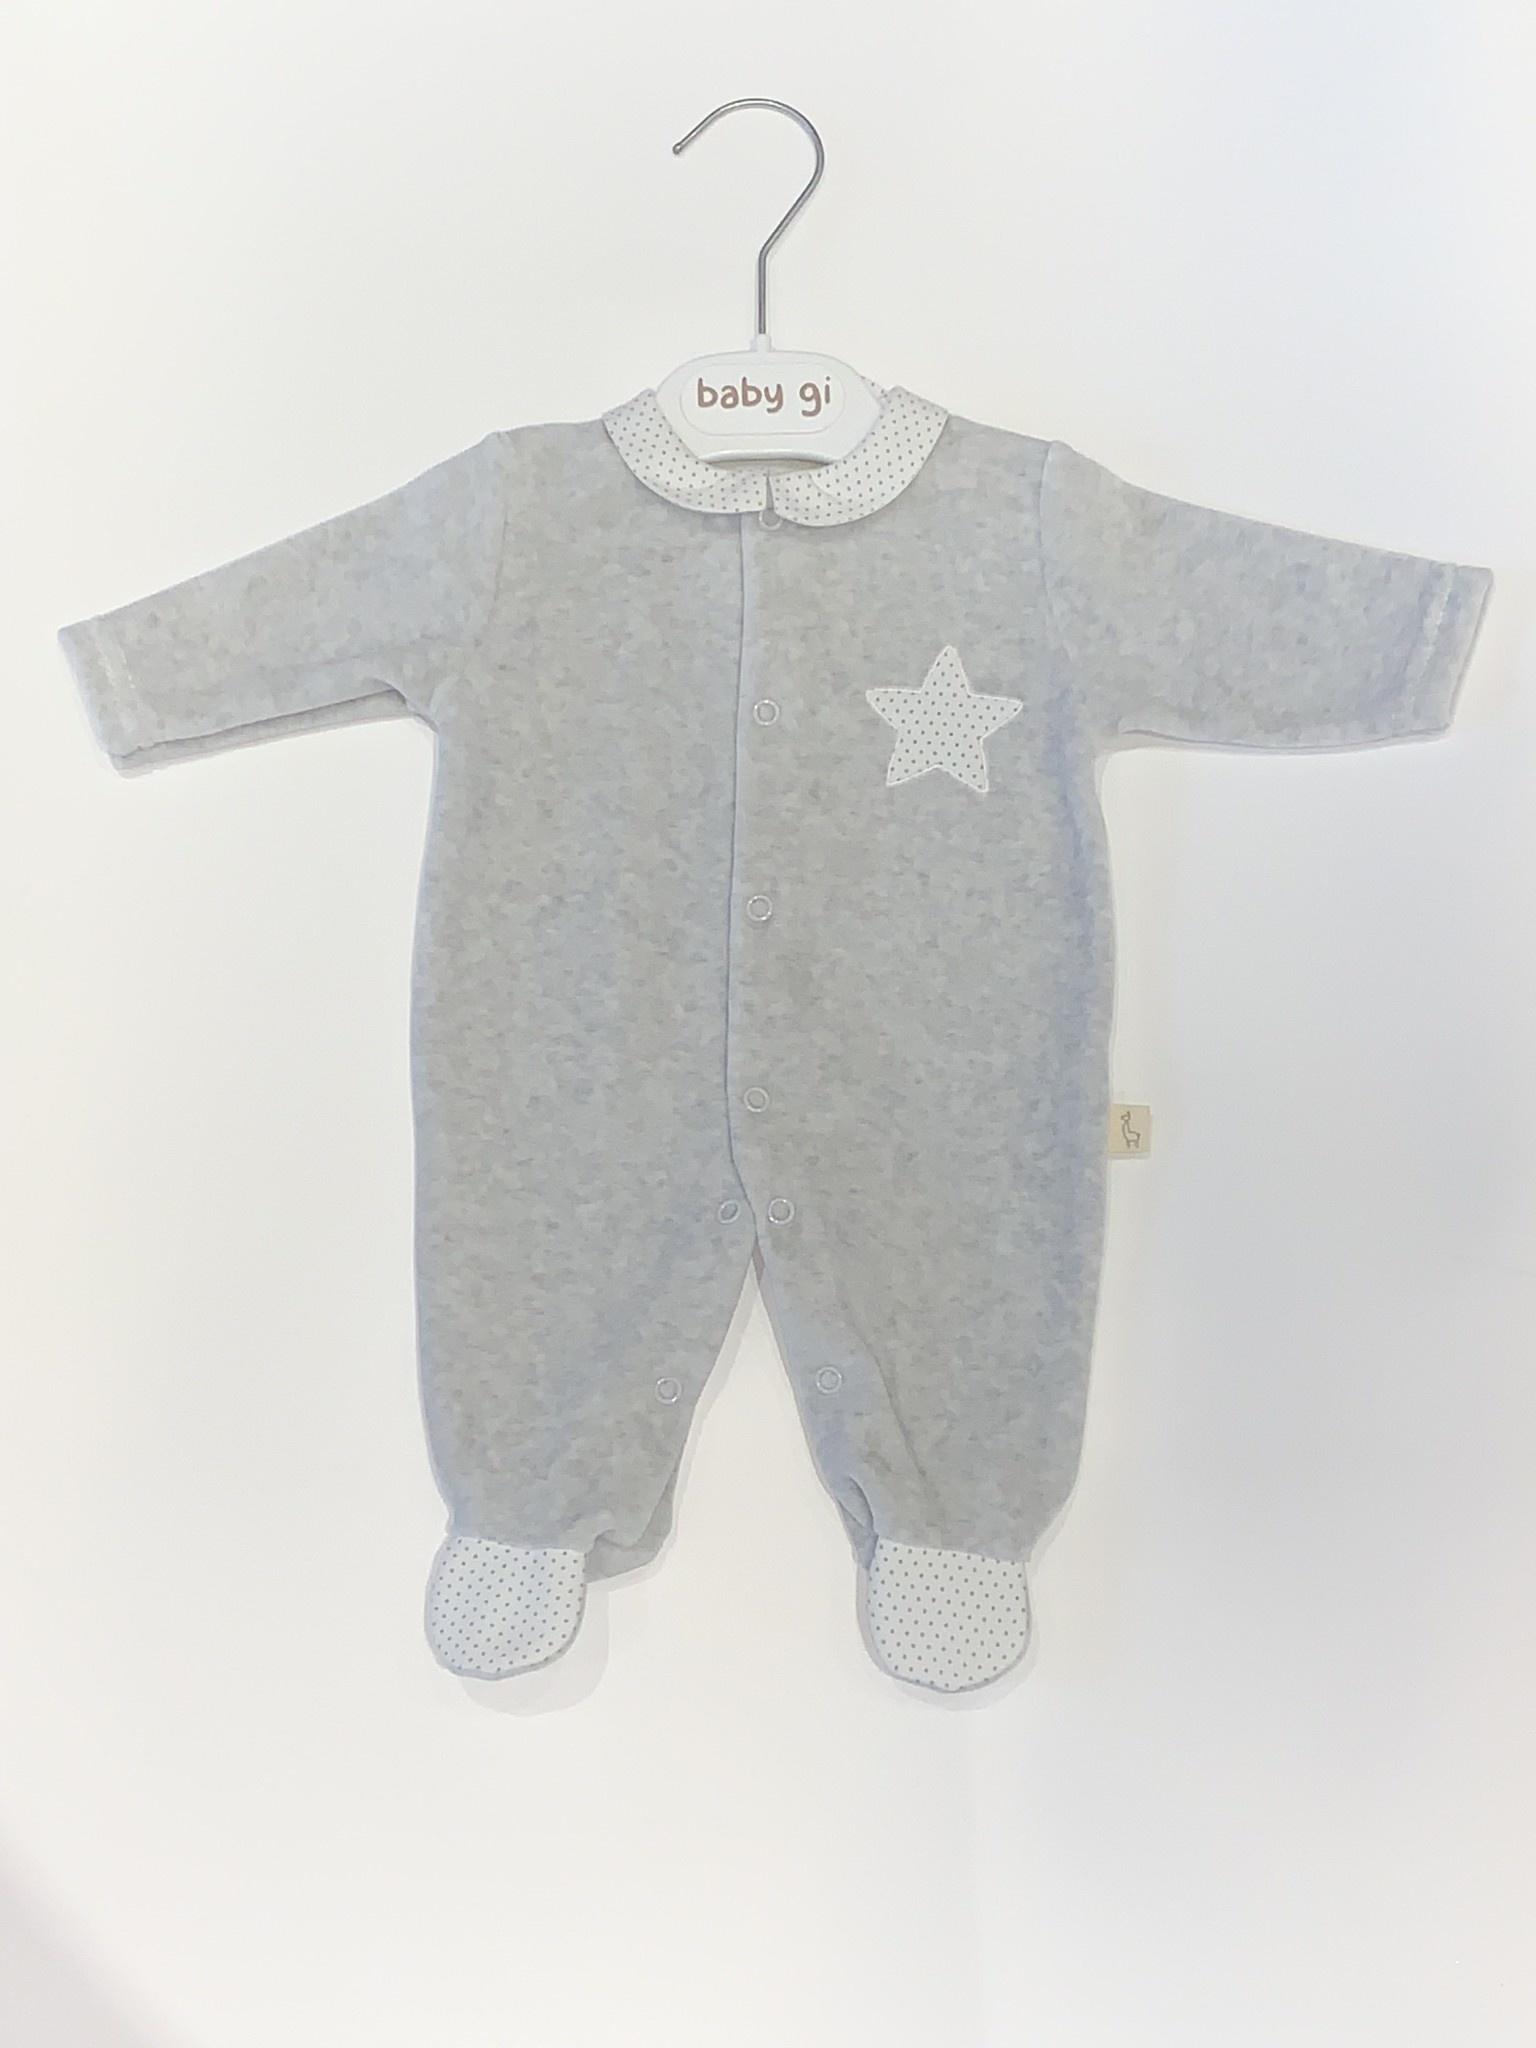 Baby Gi Baby gi grey velour star babygrow